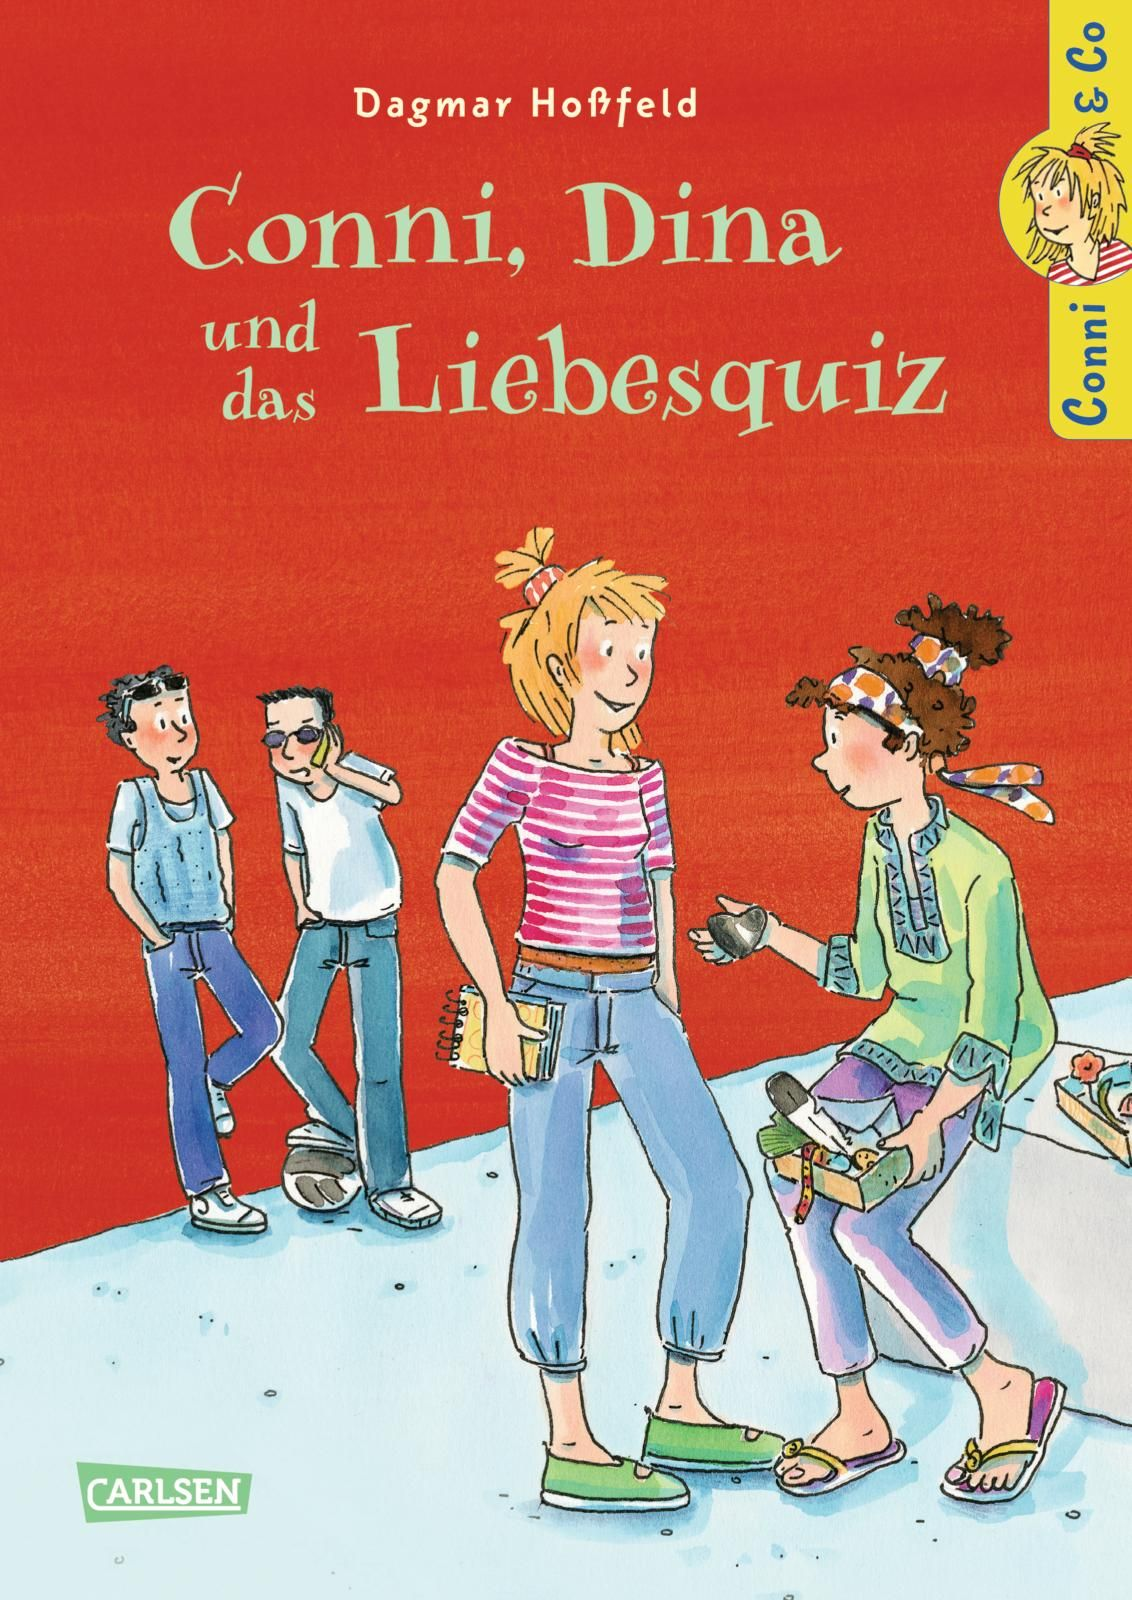 NEU Conni & Co - Conni, Dina und das Liebesquiz Dagmar Hoßfeld 554109